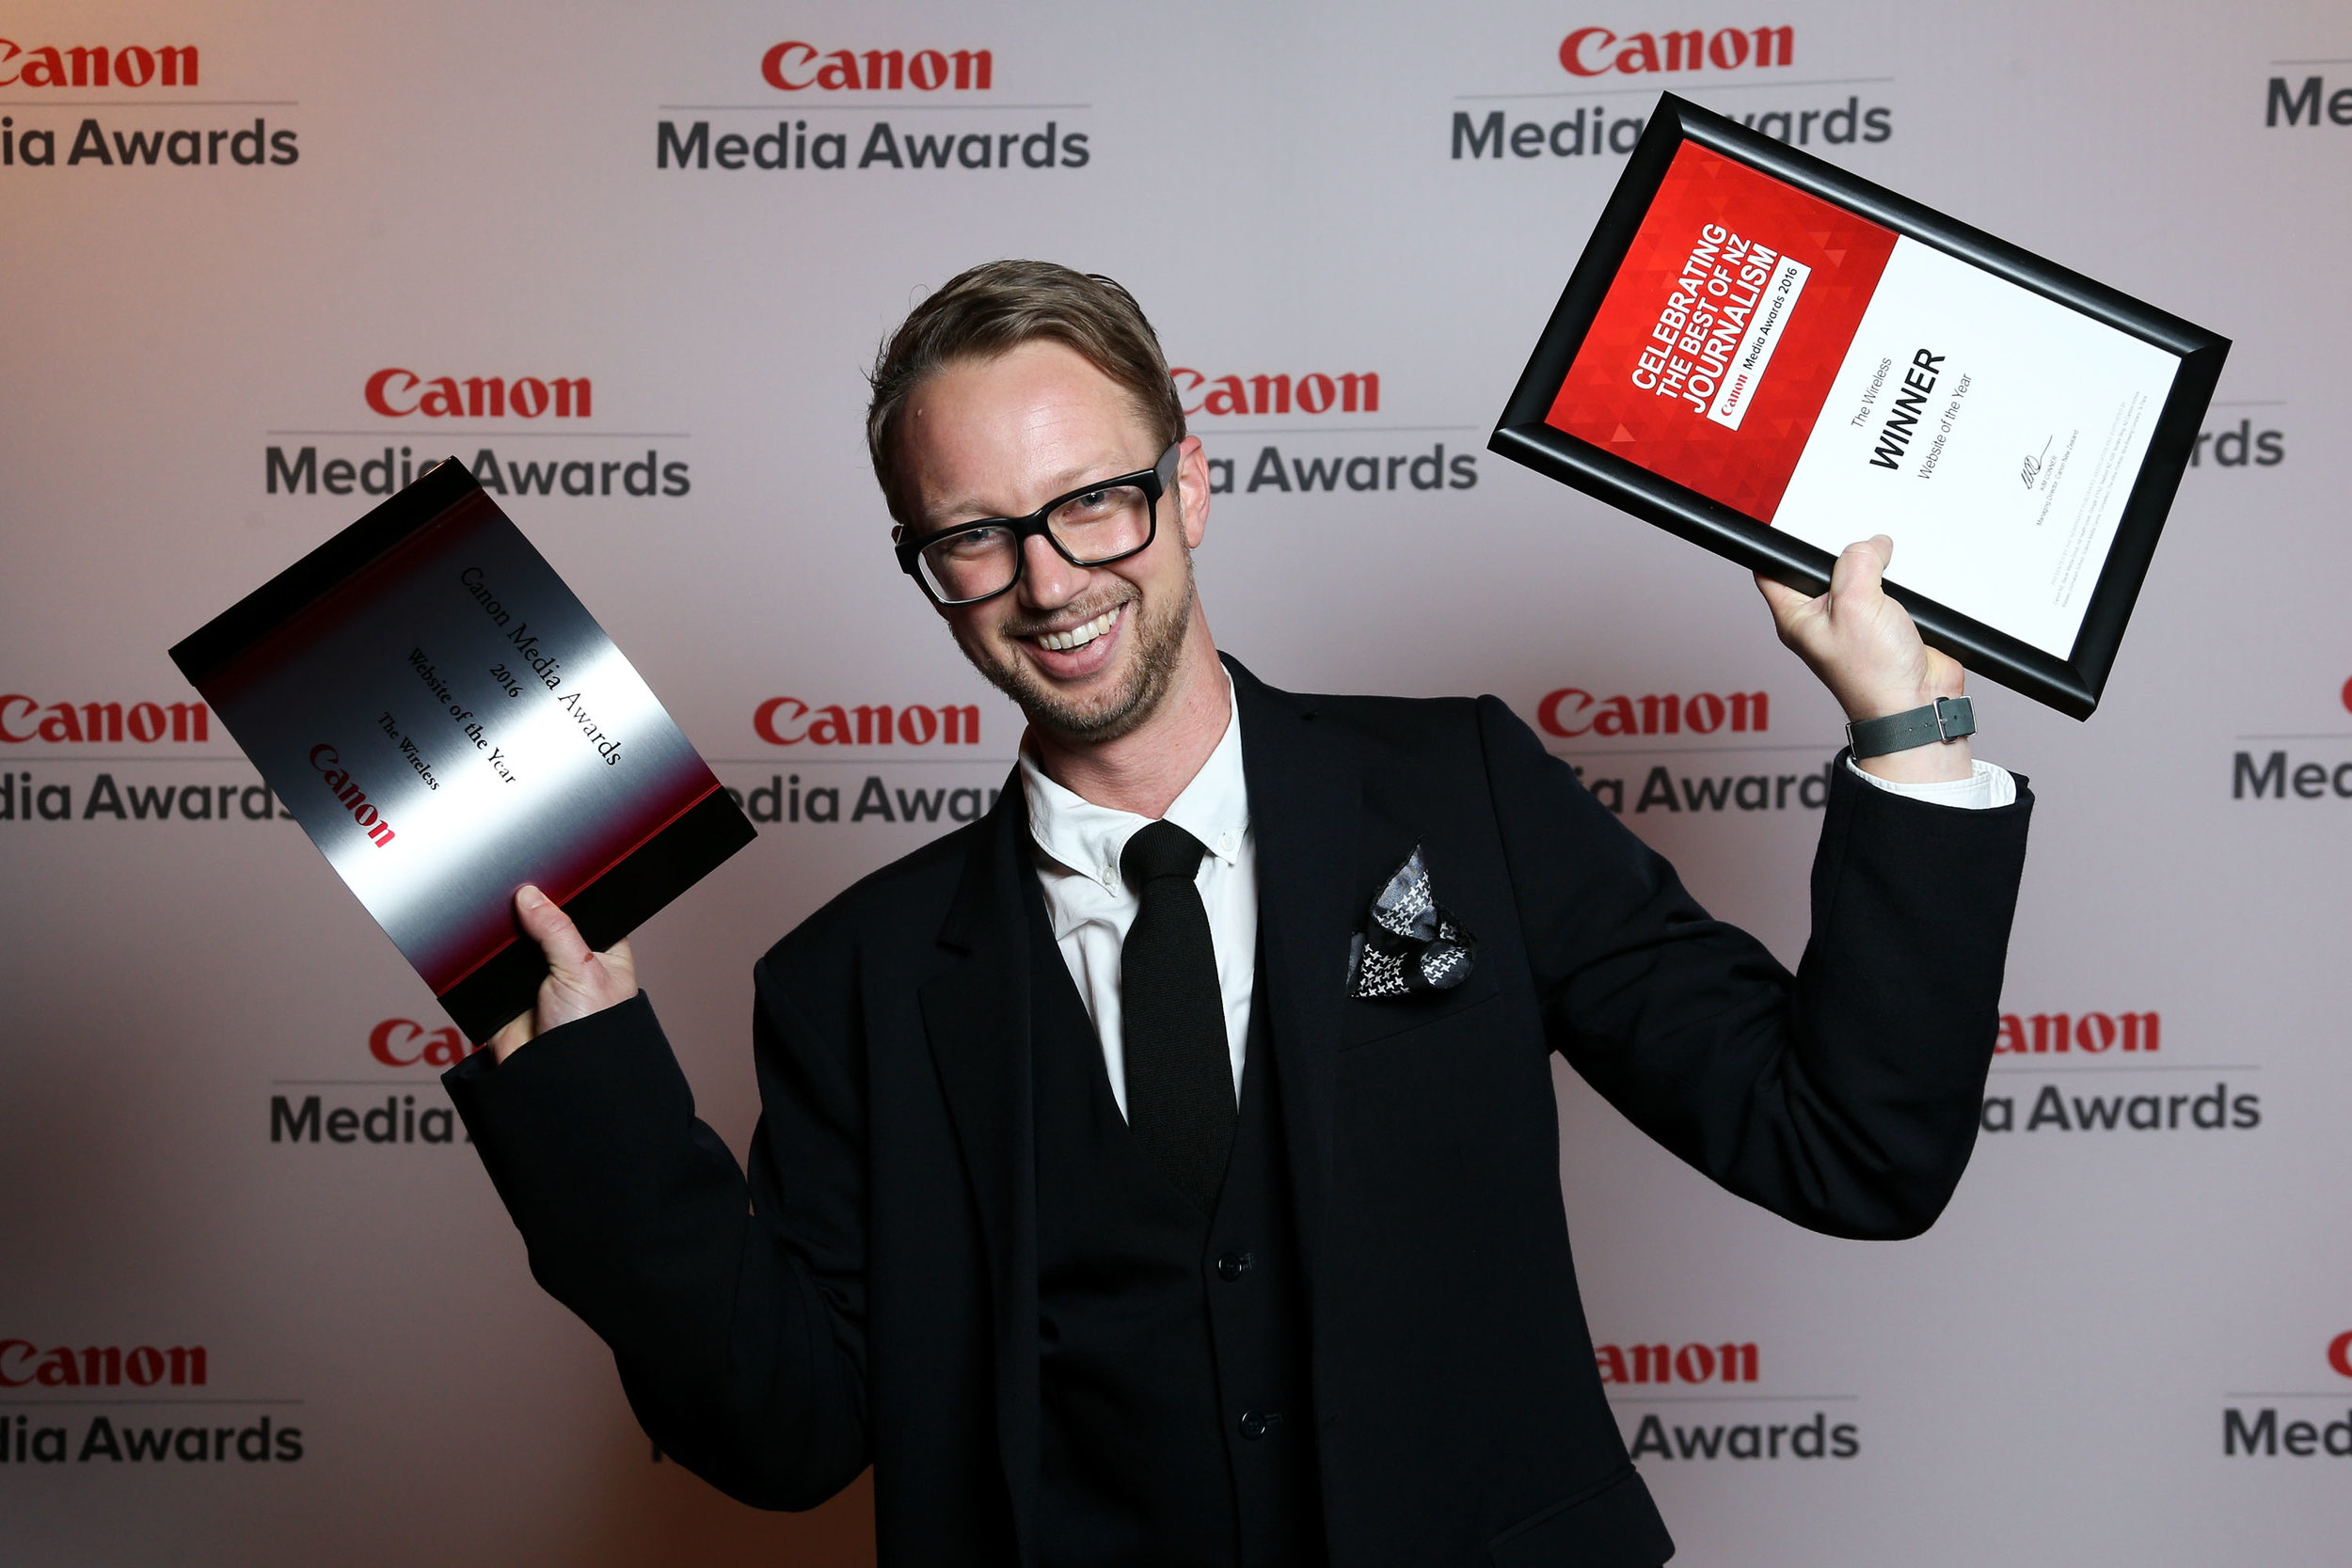 160520_Canon_Media_Awards_36.JPG